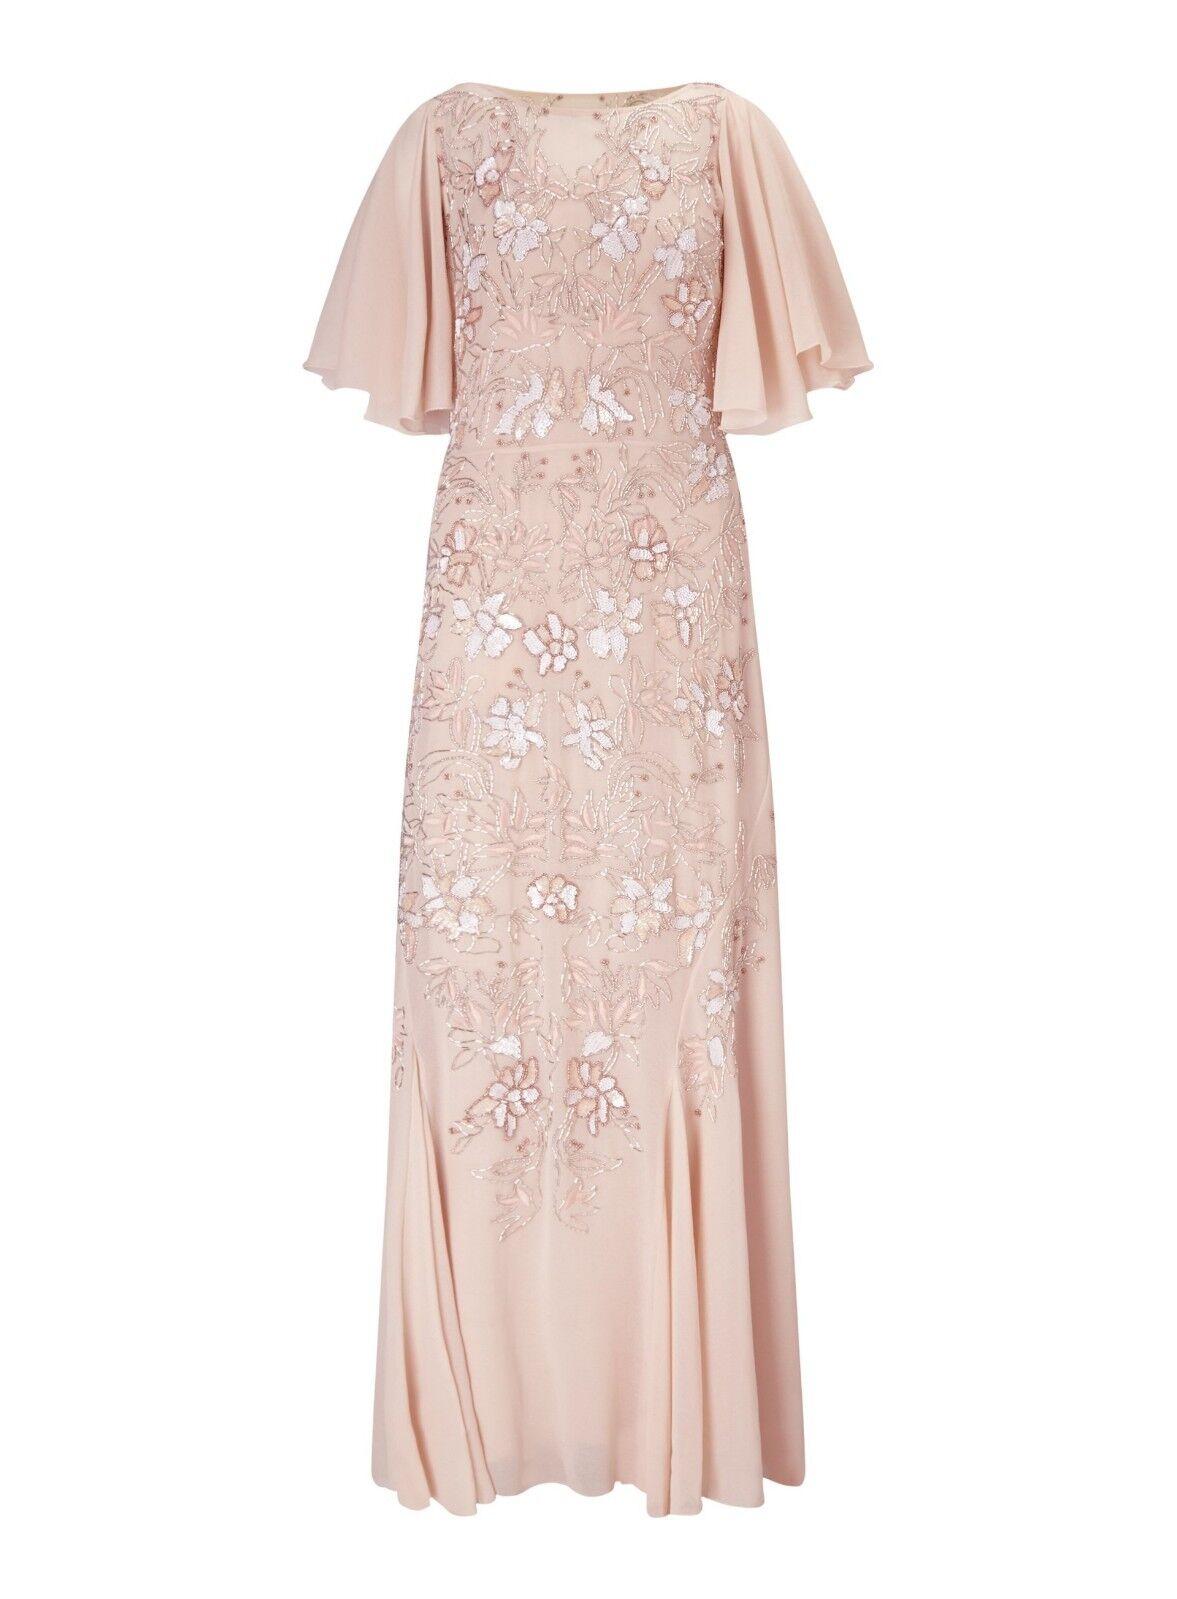 Miss Selfridge Gr. L 40 Damen Maxikleid Coctailkleid Kleid Nude Pailletten A6069